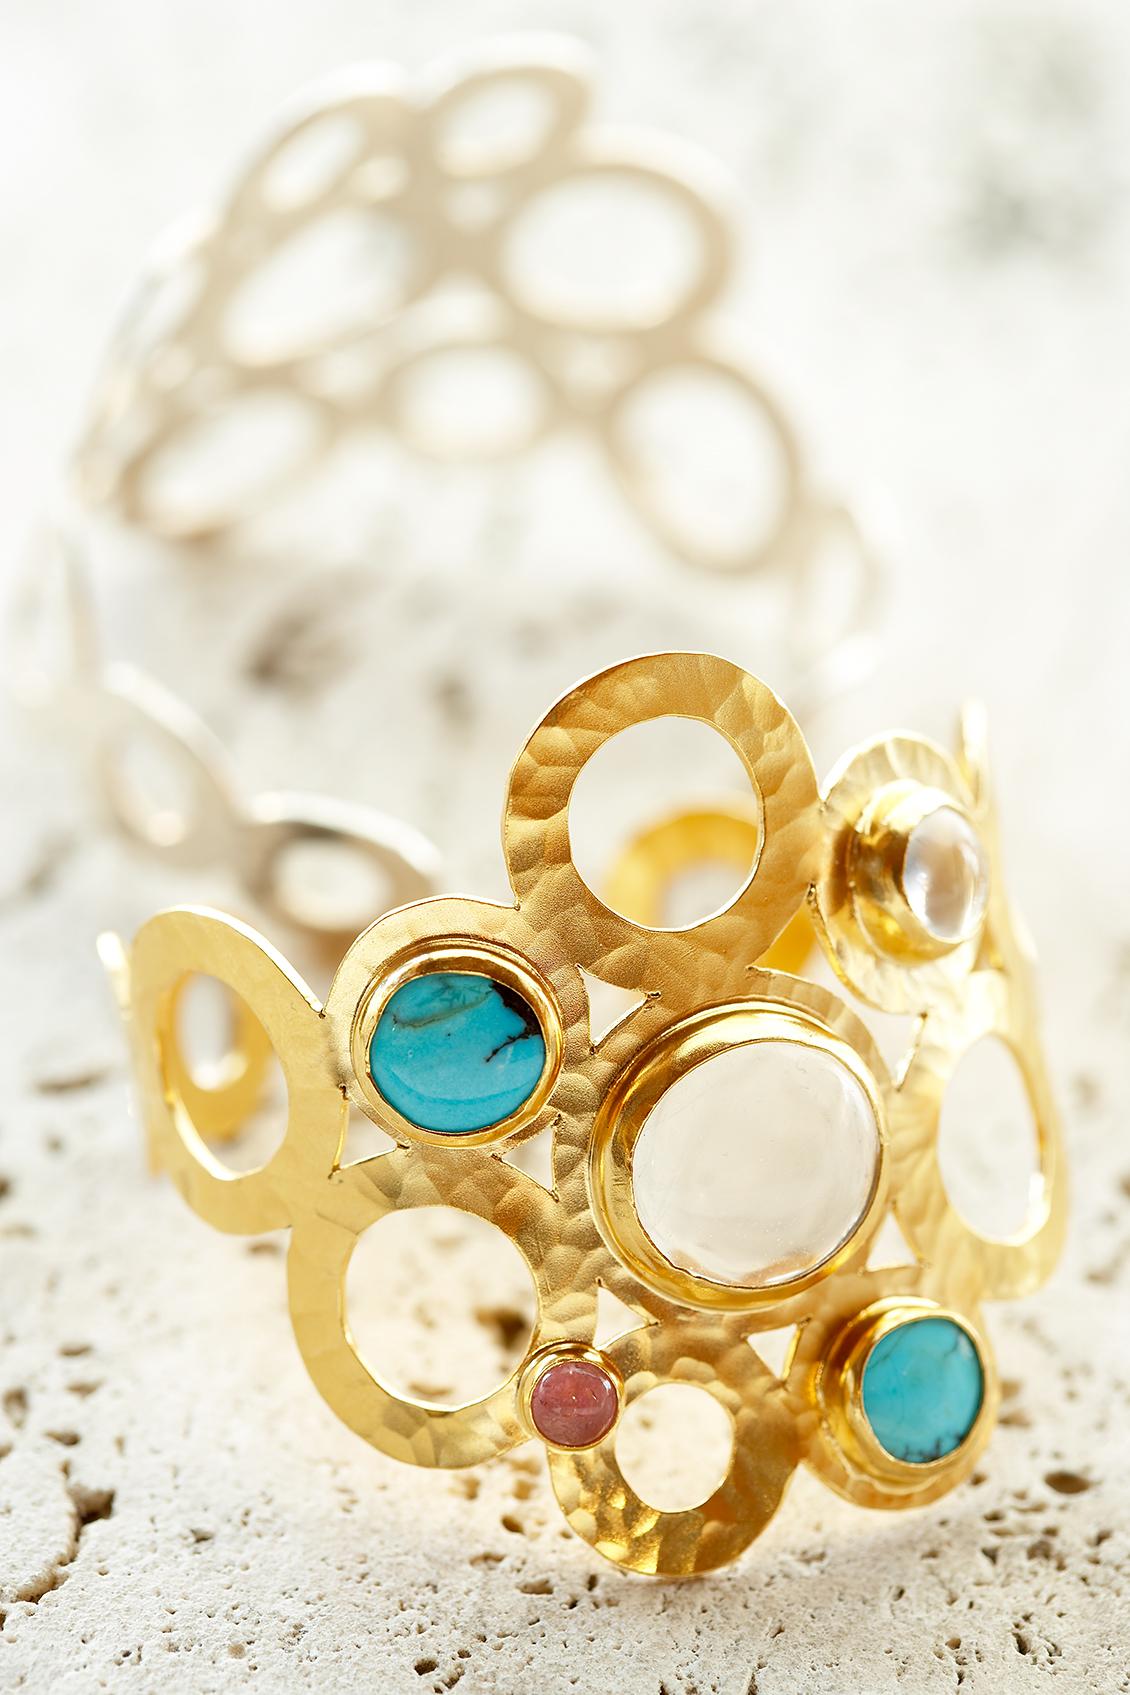 cuff bracelet product photo